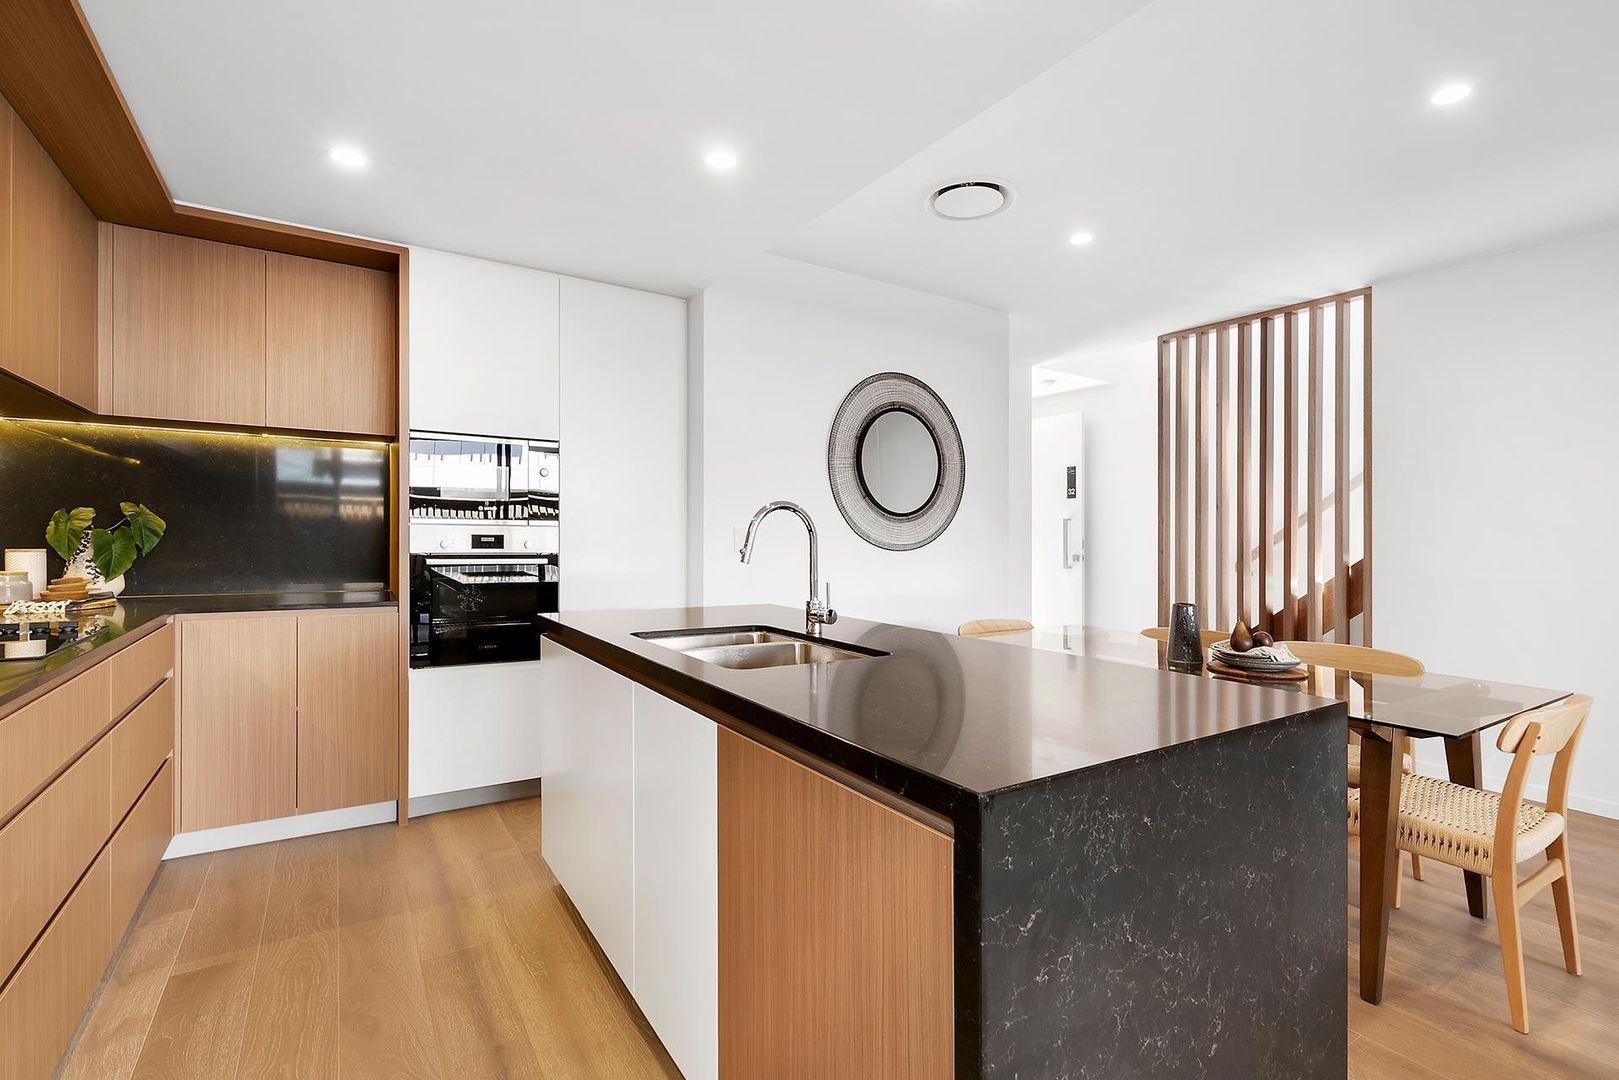 50/66 Illowra Street, The Gap QLD 4061, Image 0